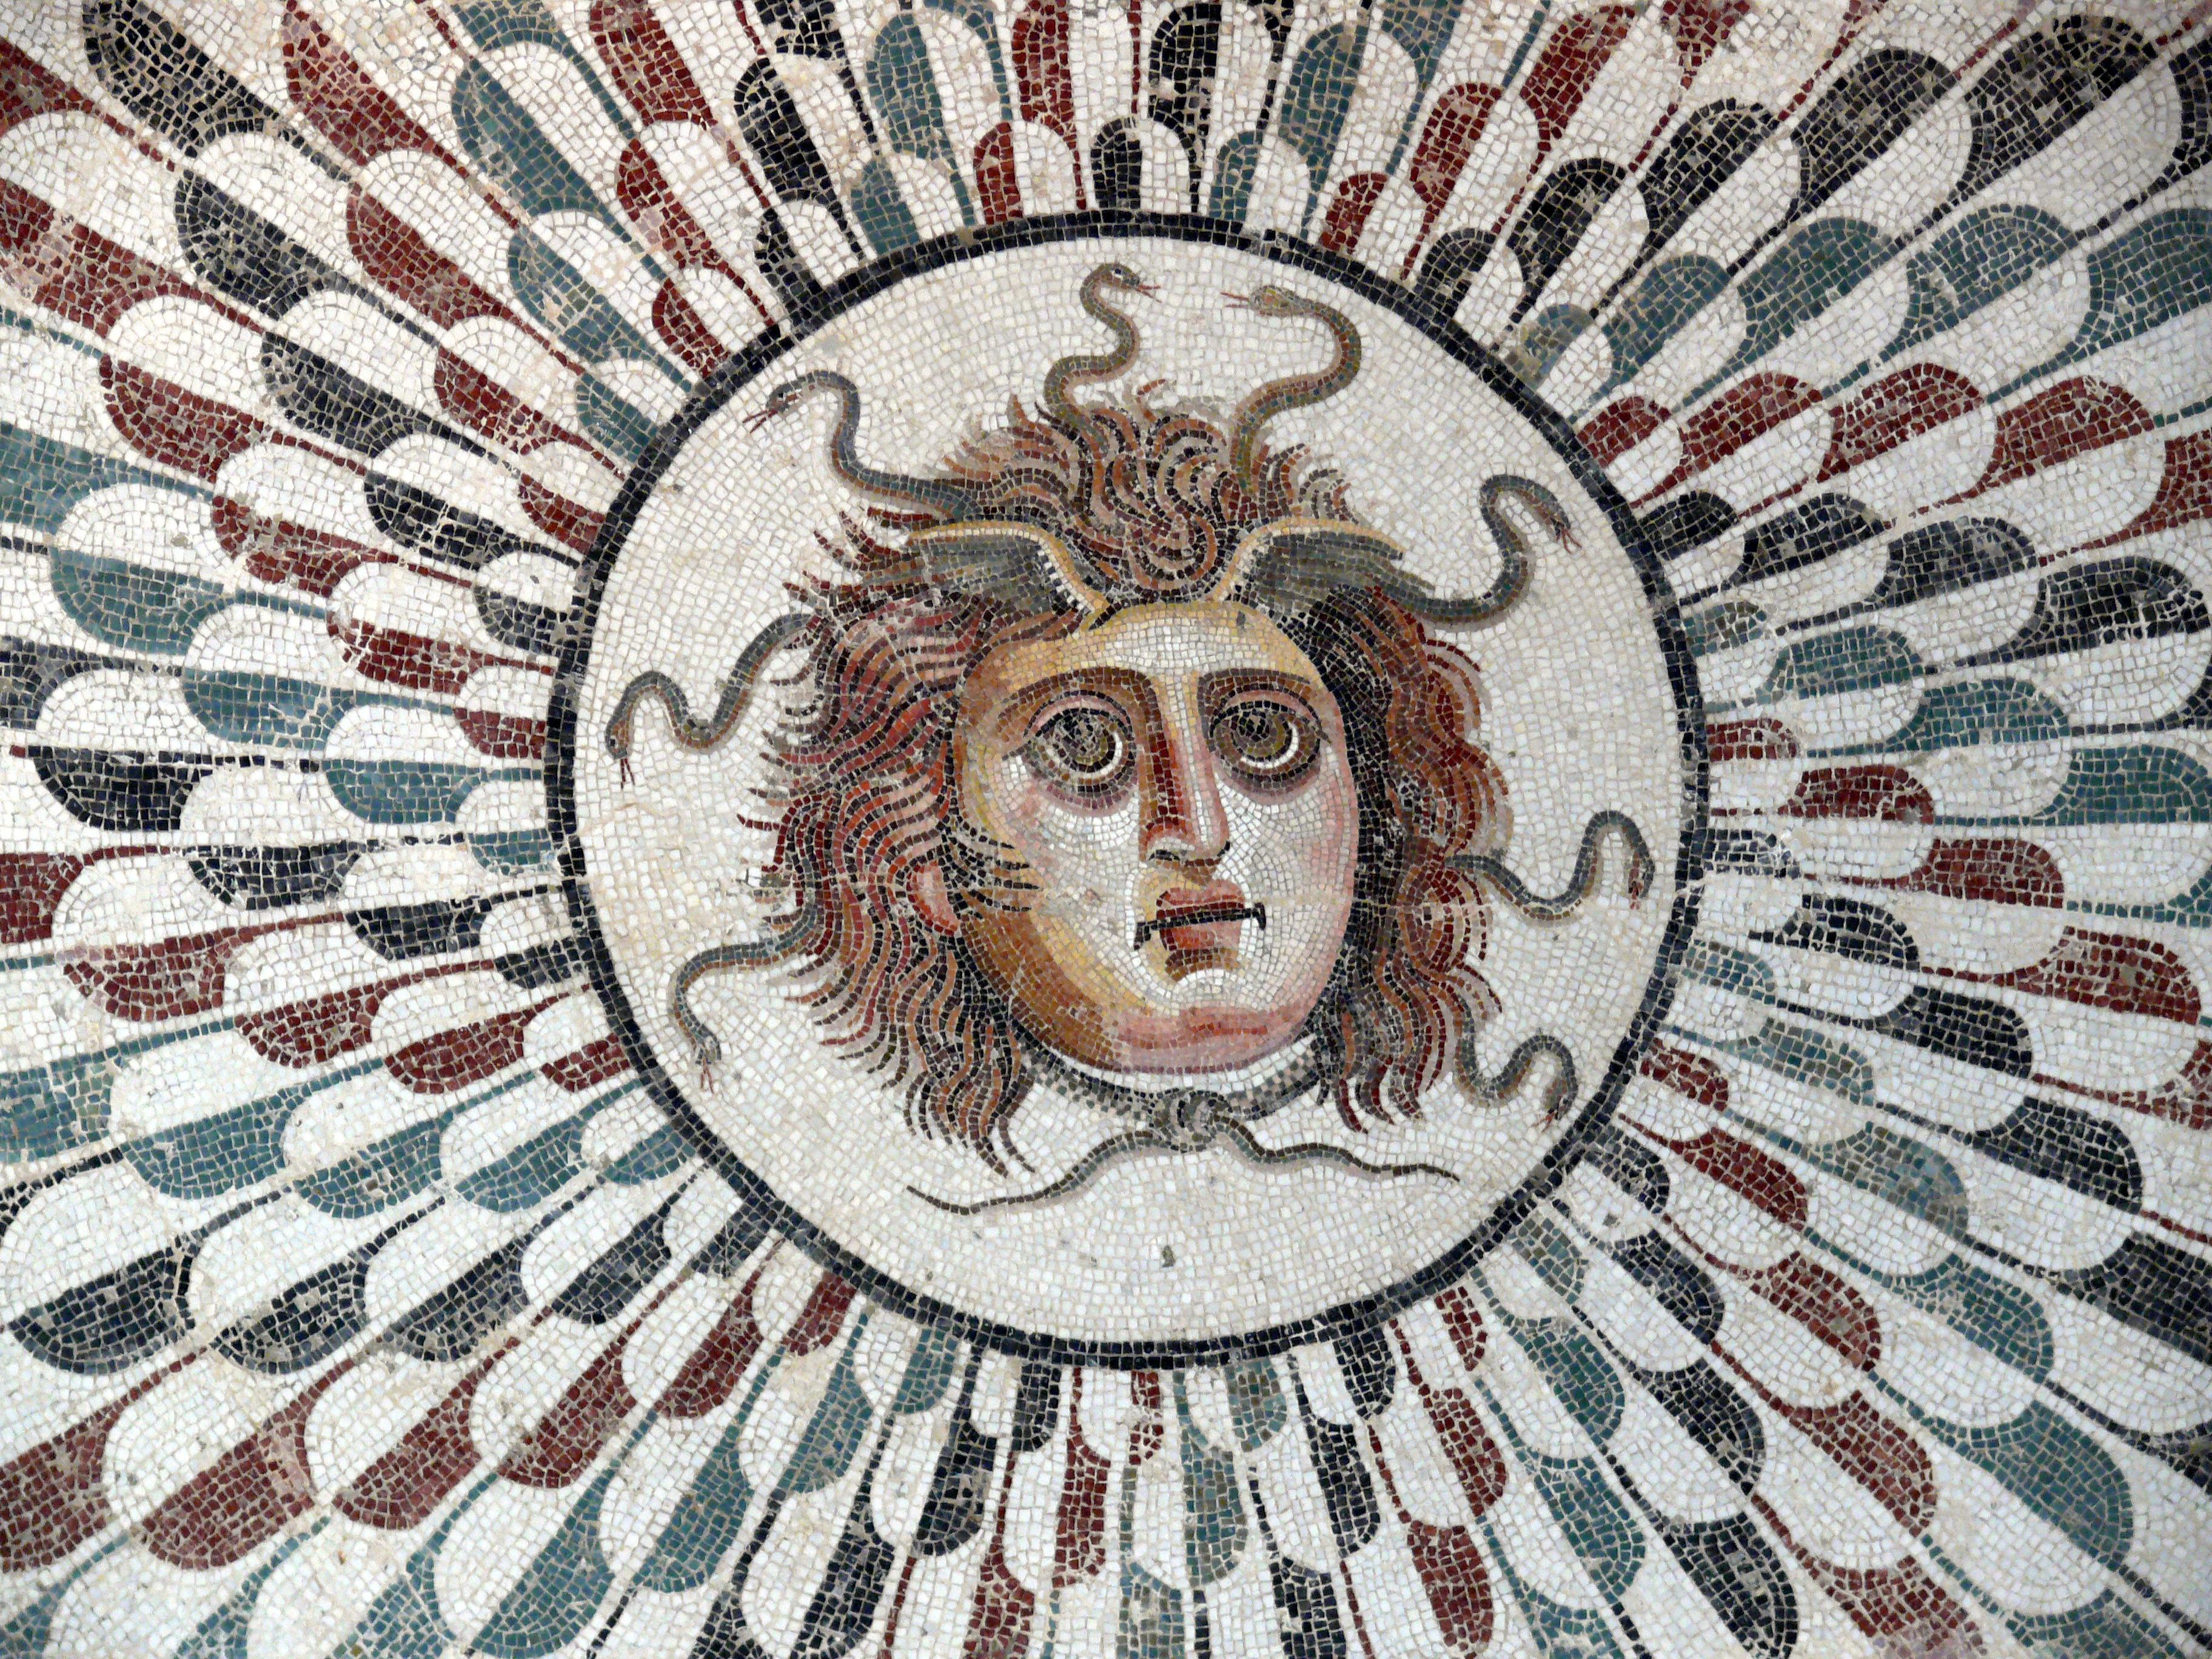 The Medusa's Head Central to a